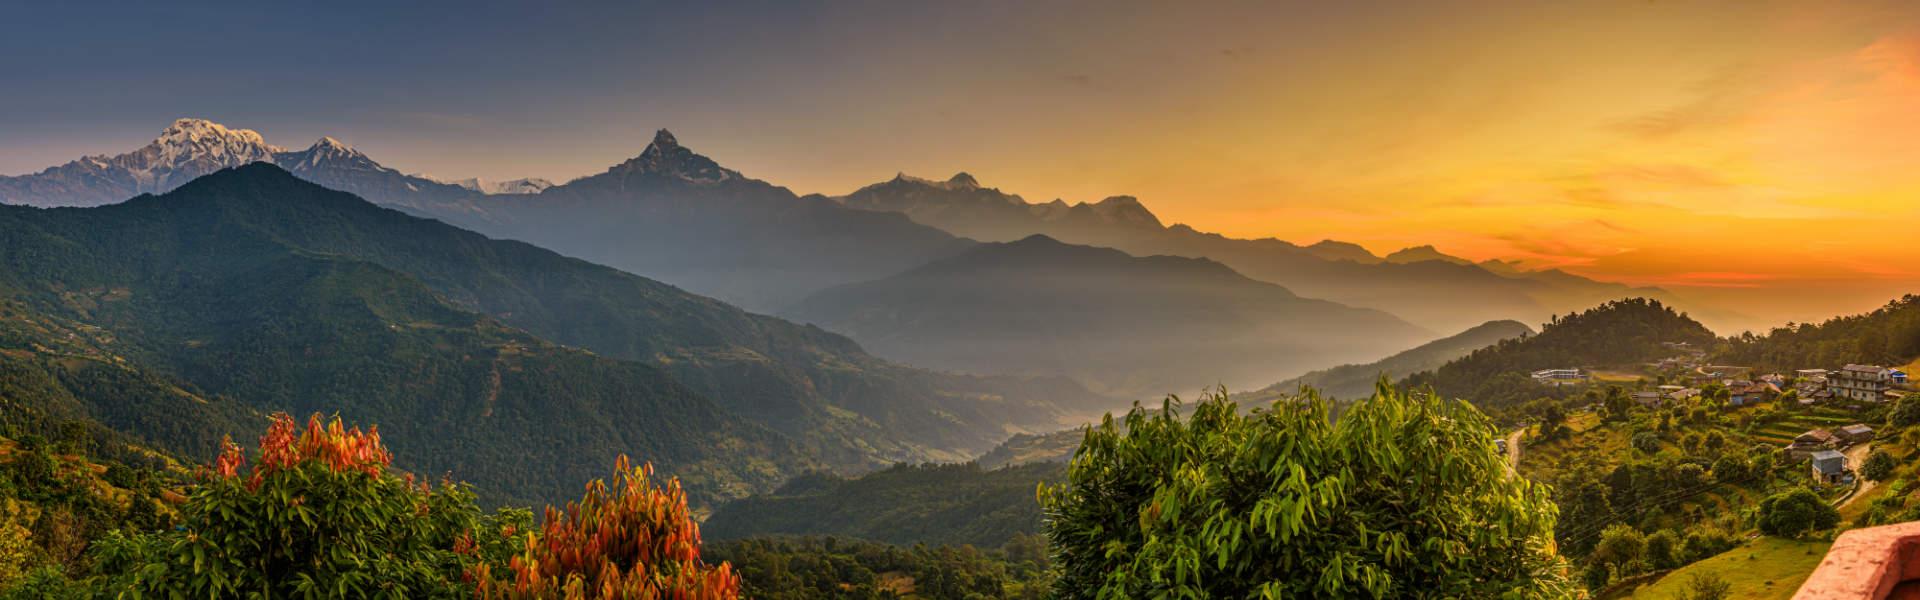 Bespoke treks in Nepal with Nepalorama